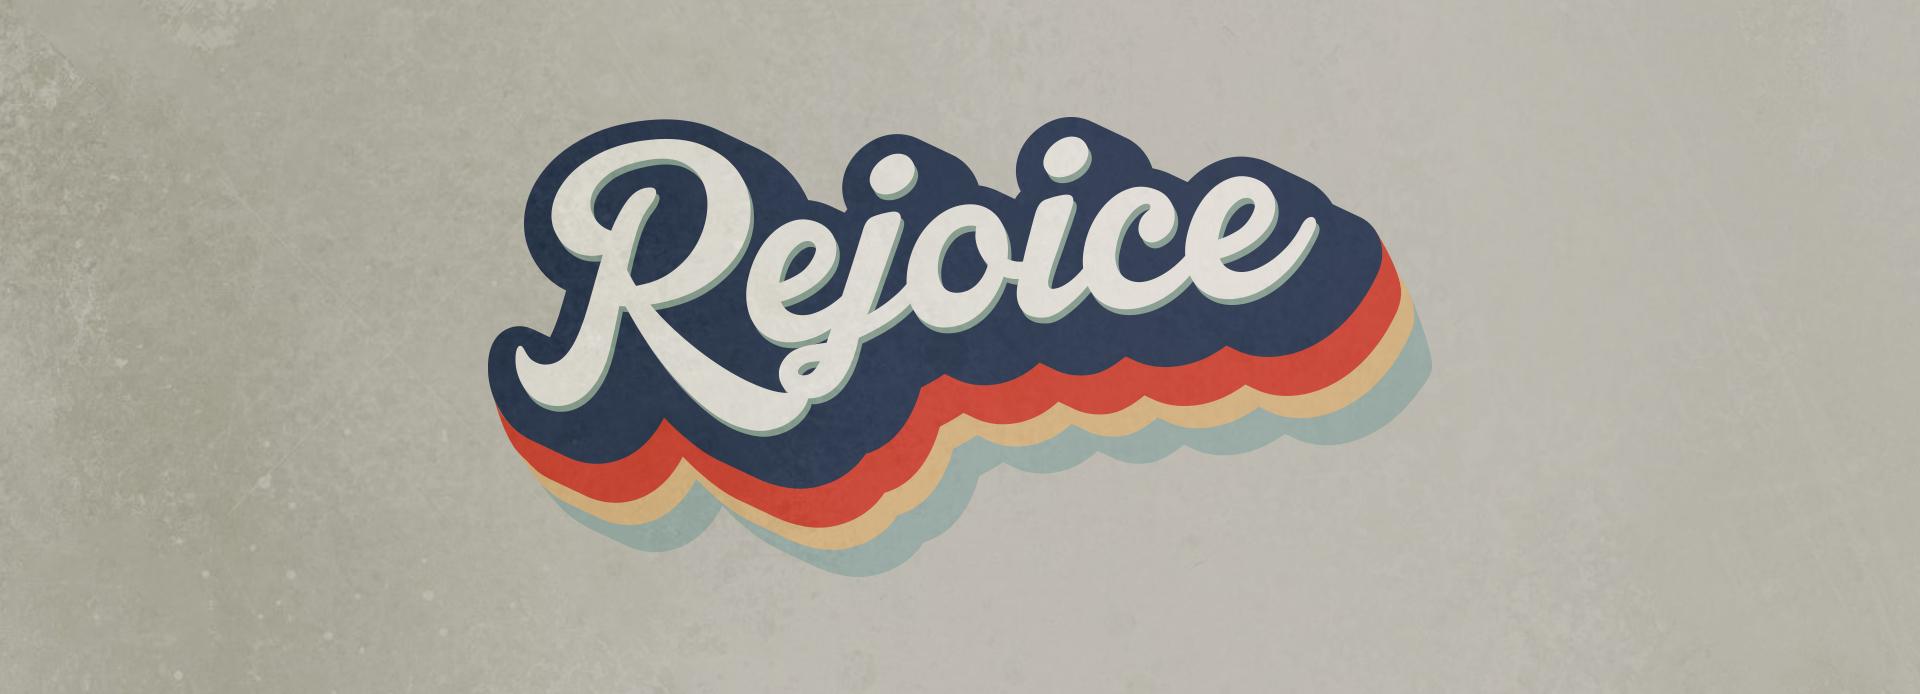 Philippians-Rejoice_BANNER.jpg